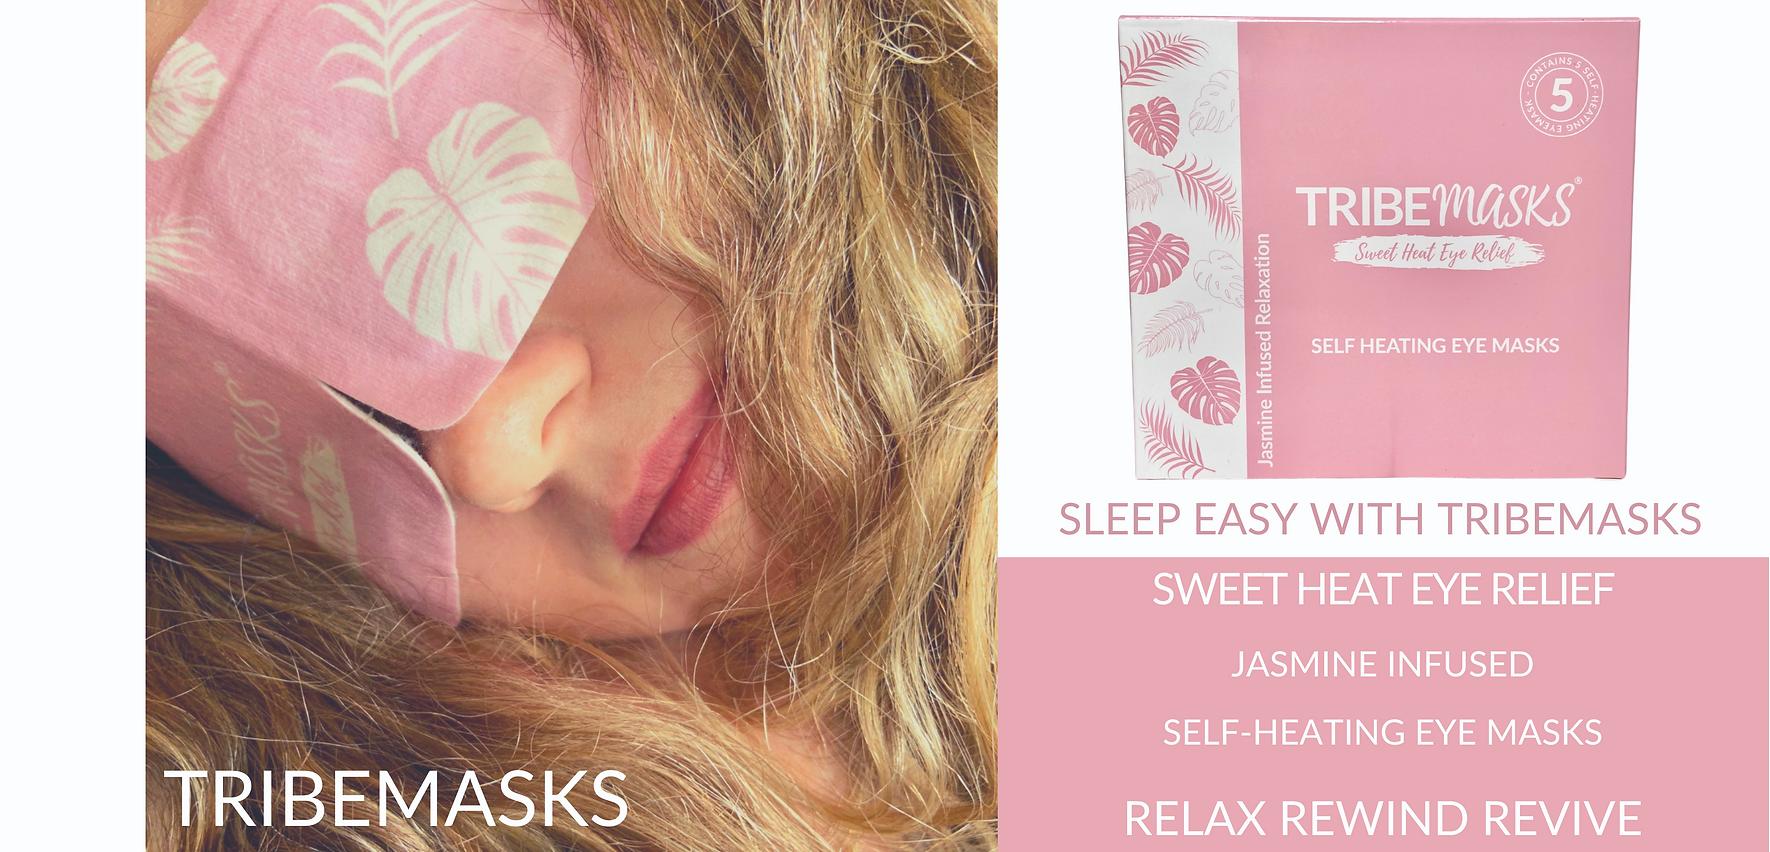 Tribemasks self-heating eye masks